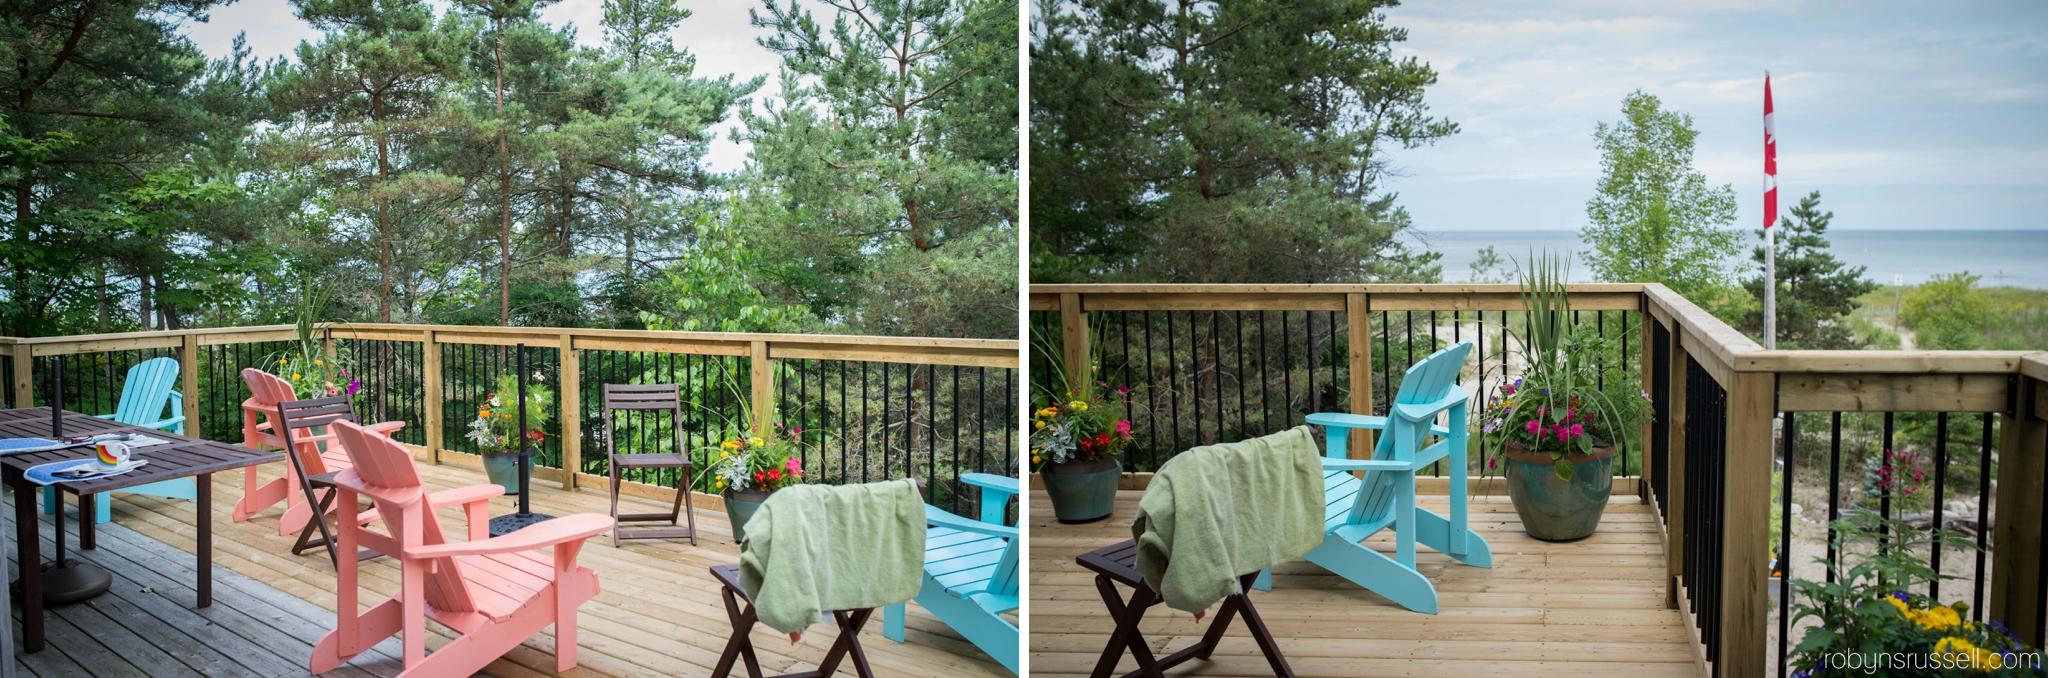 18-cottage-backyard-overlooking-collingwood-beach.jpg